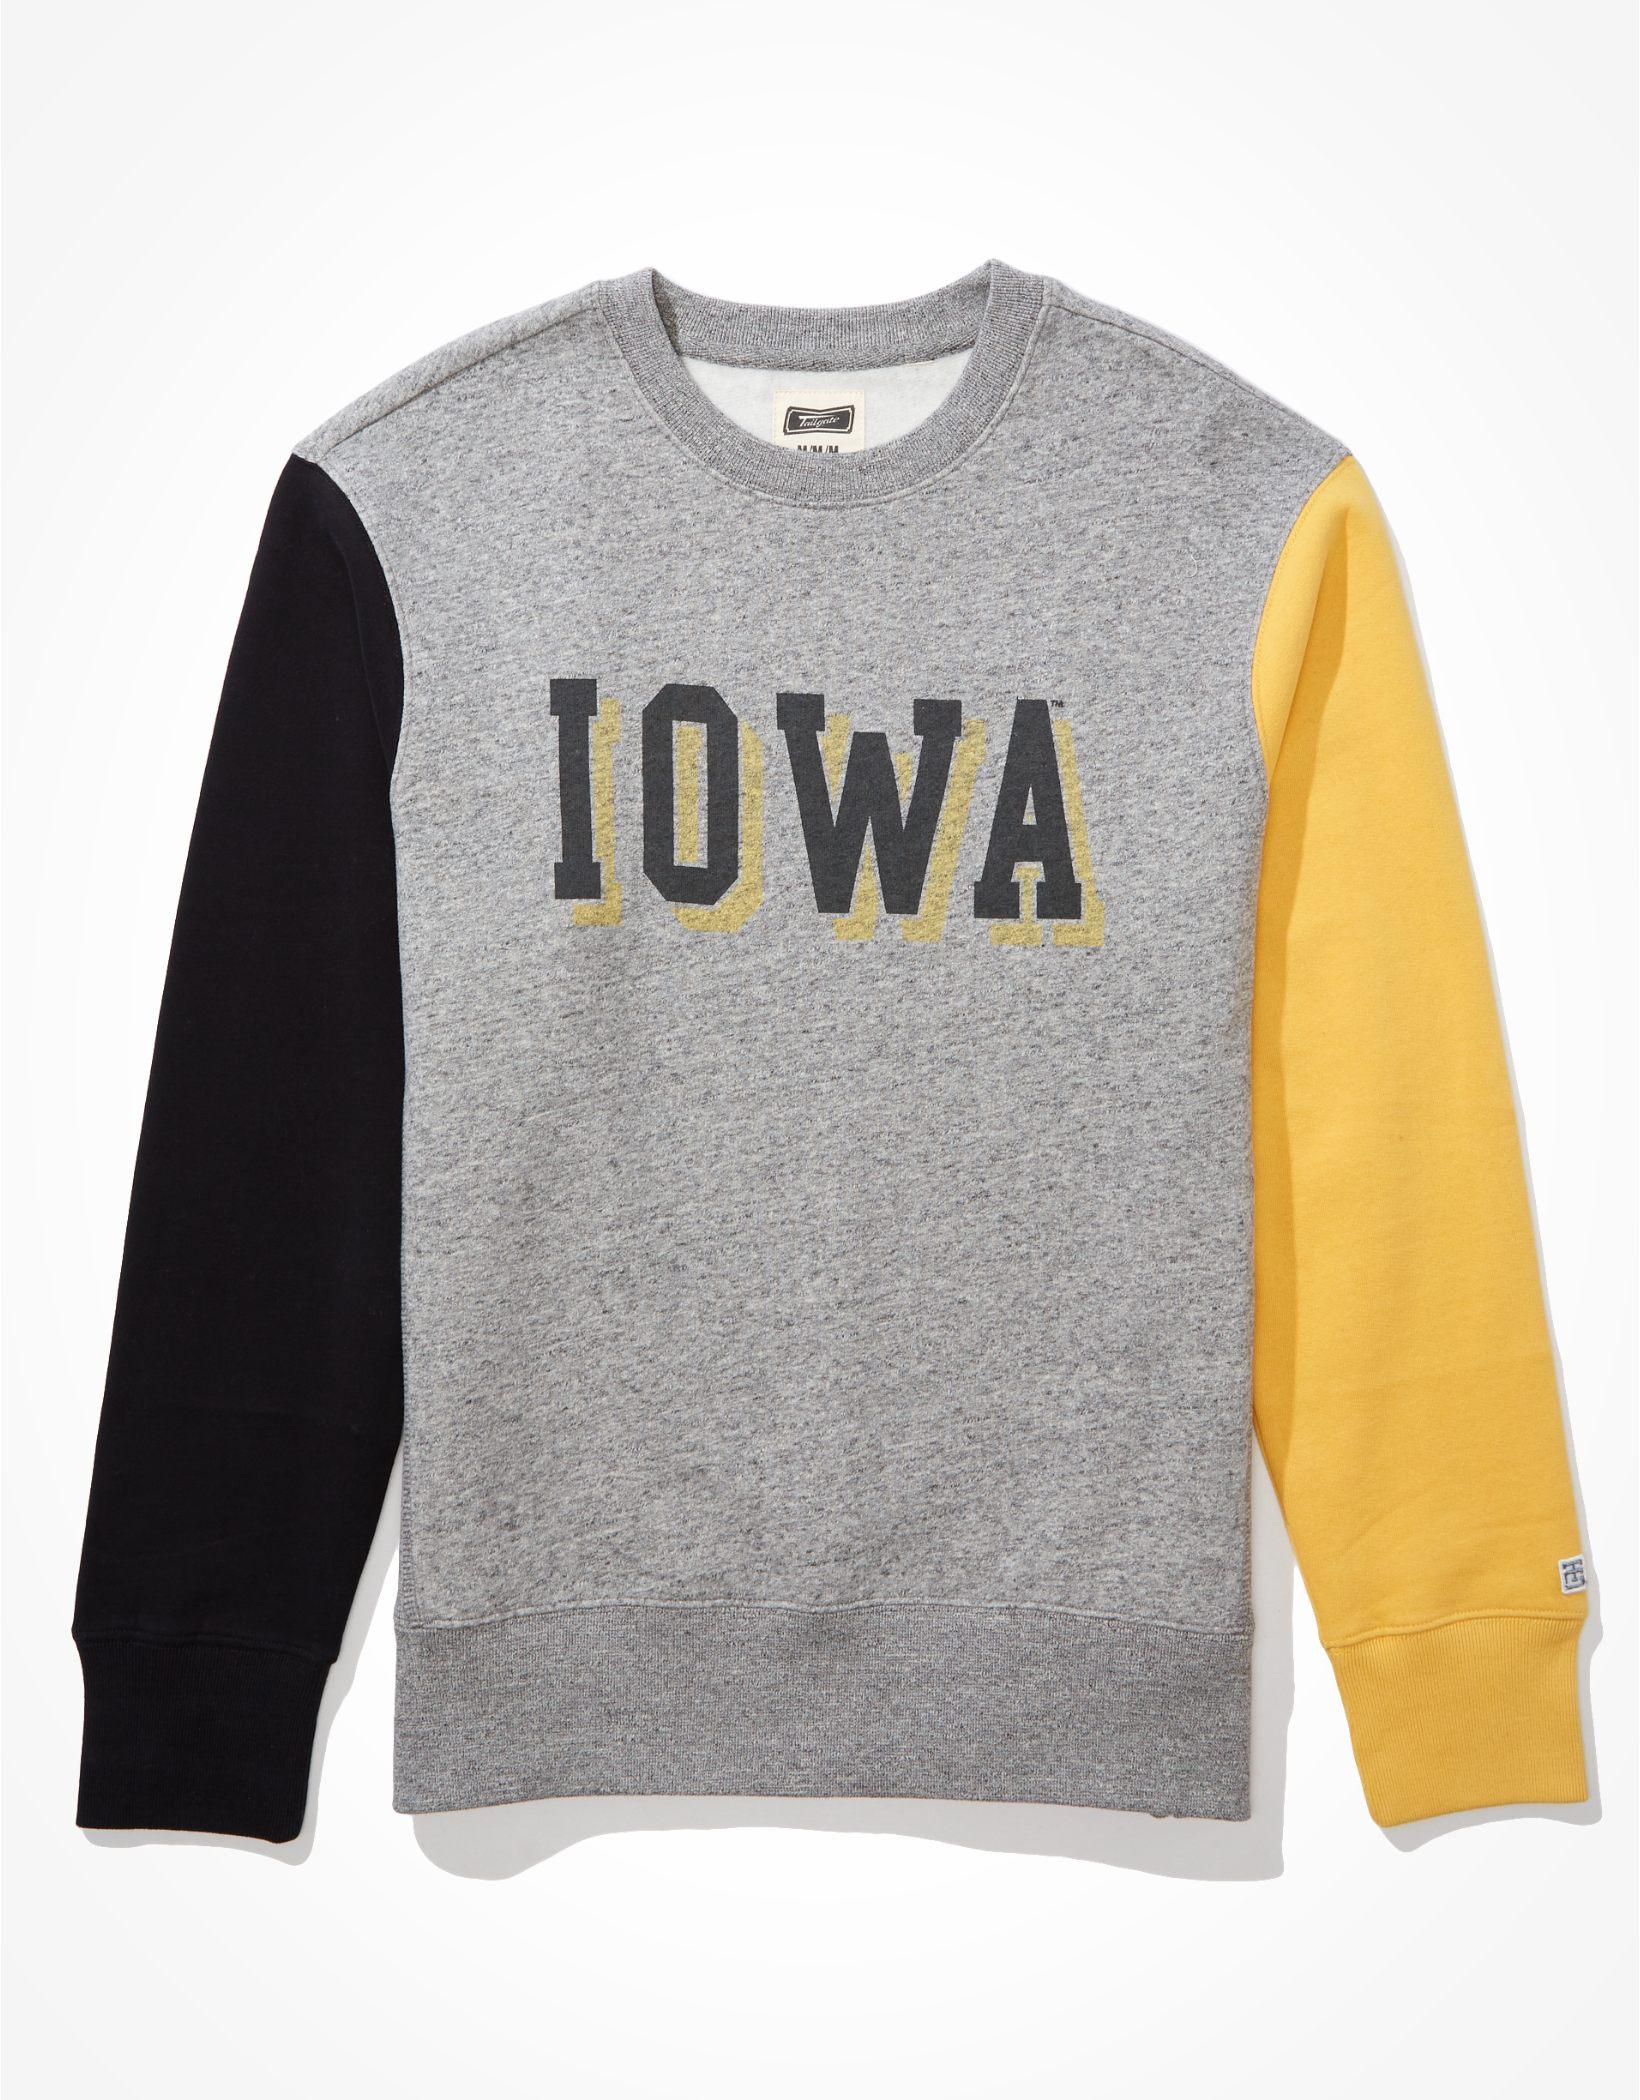 Tailgate Men's Iowa Hawkeyes Colorblock Sweatshirt